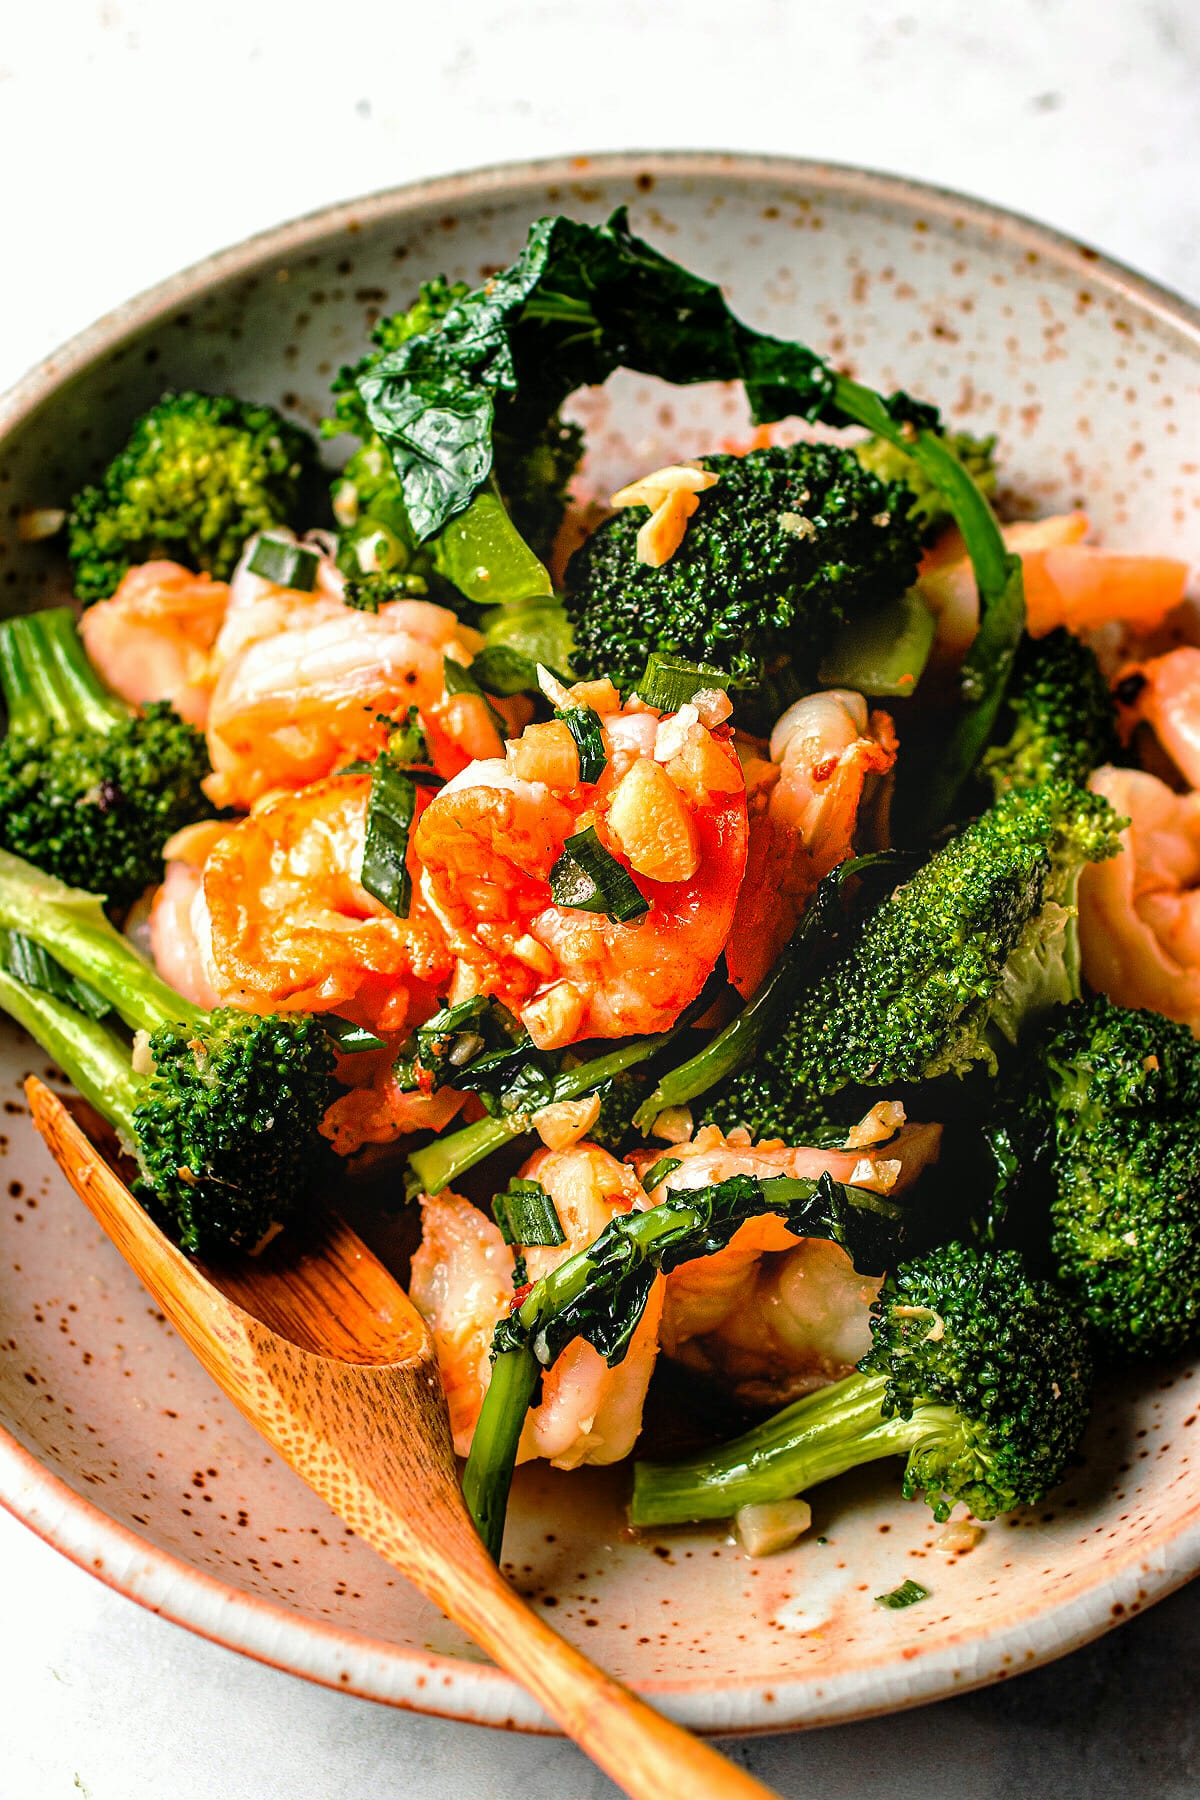 Chinese shrimp and broccoli stir-fry recipe in ginger garlic sauce I Heart Umami.